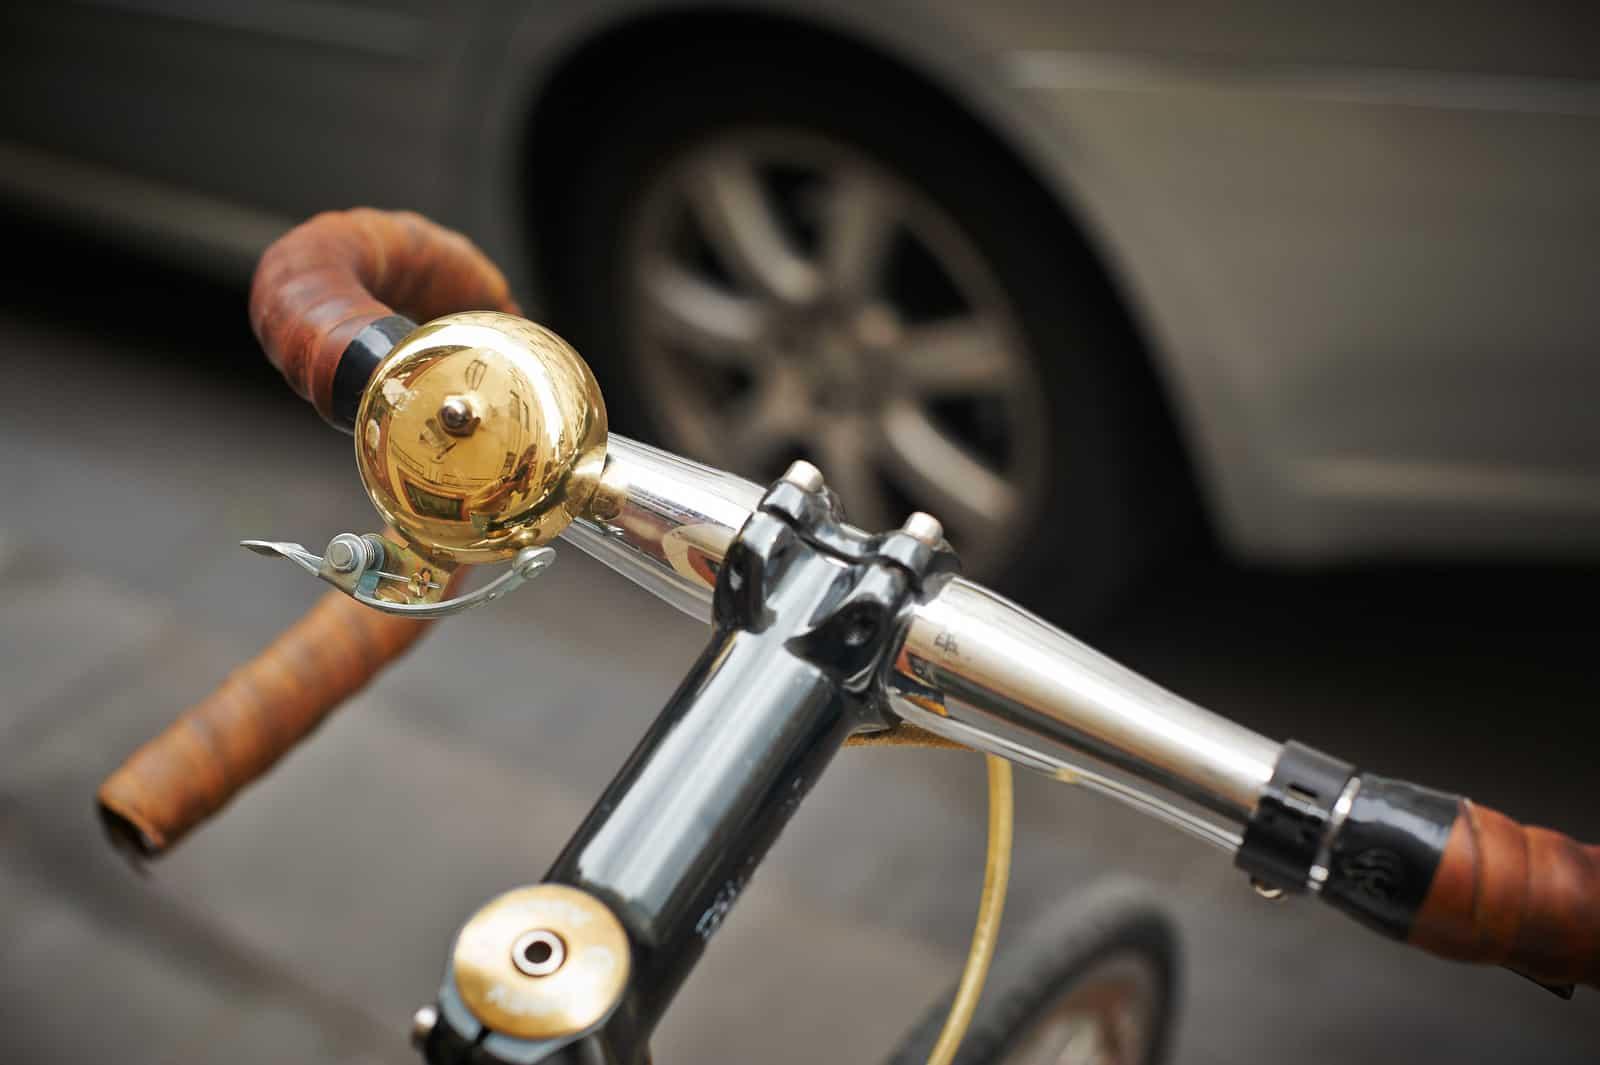 gold bike bell installed